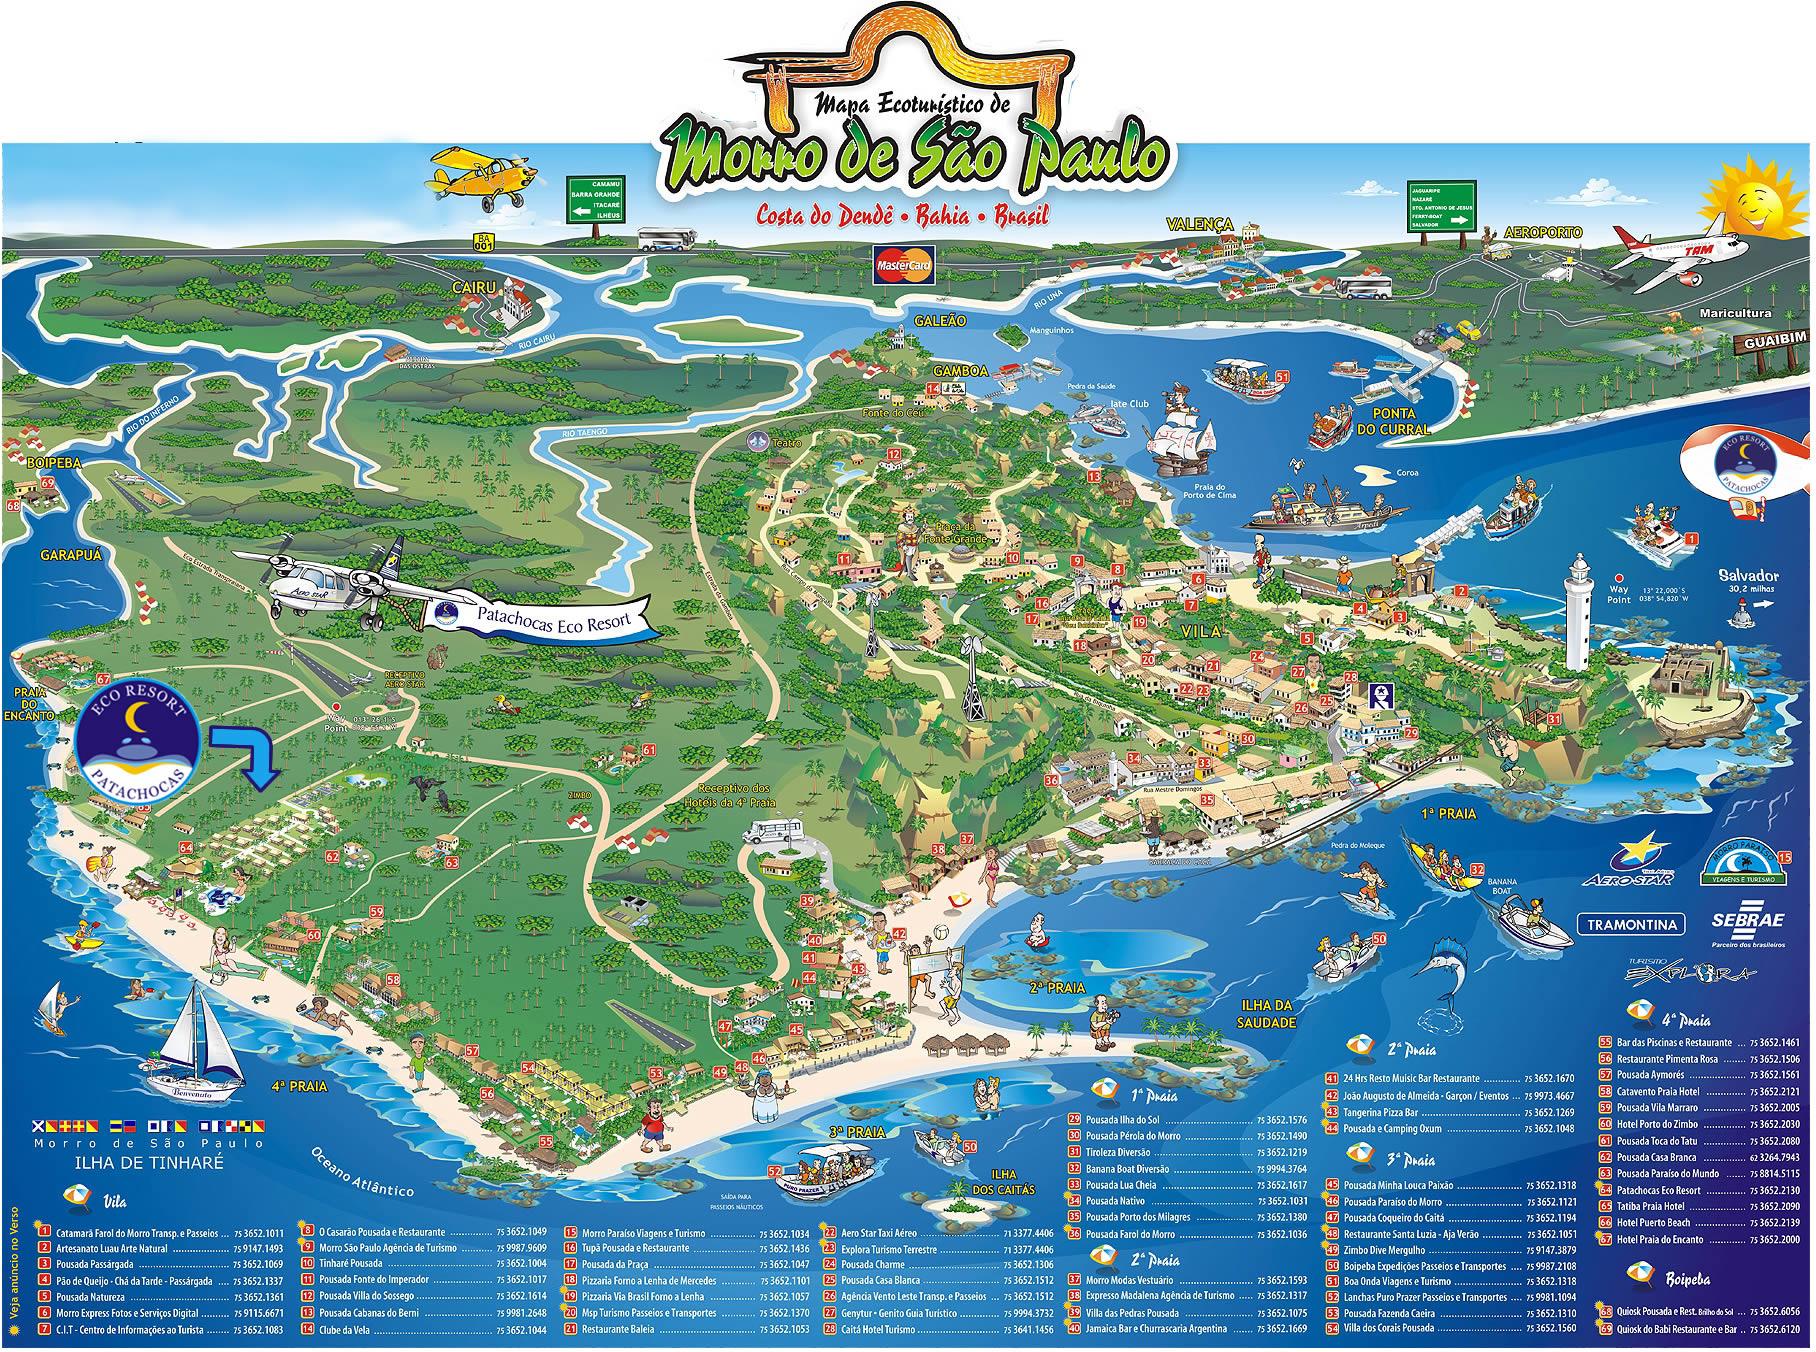 mapa morro de são paulo